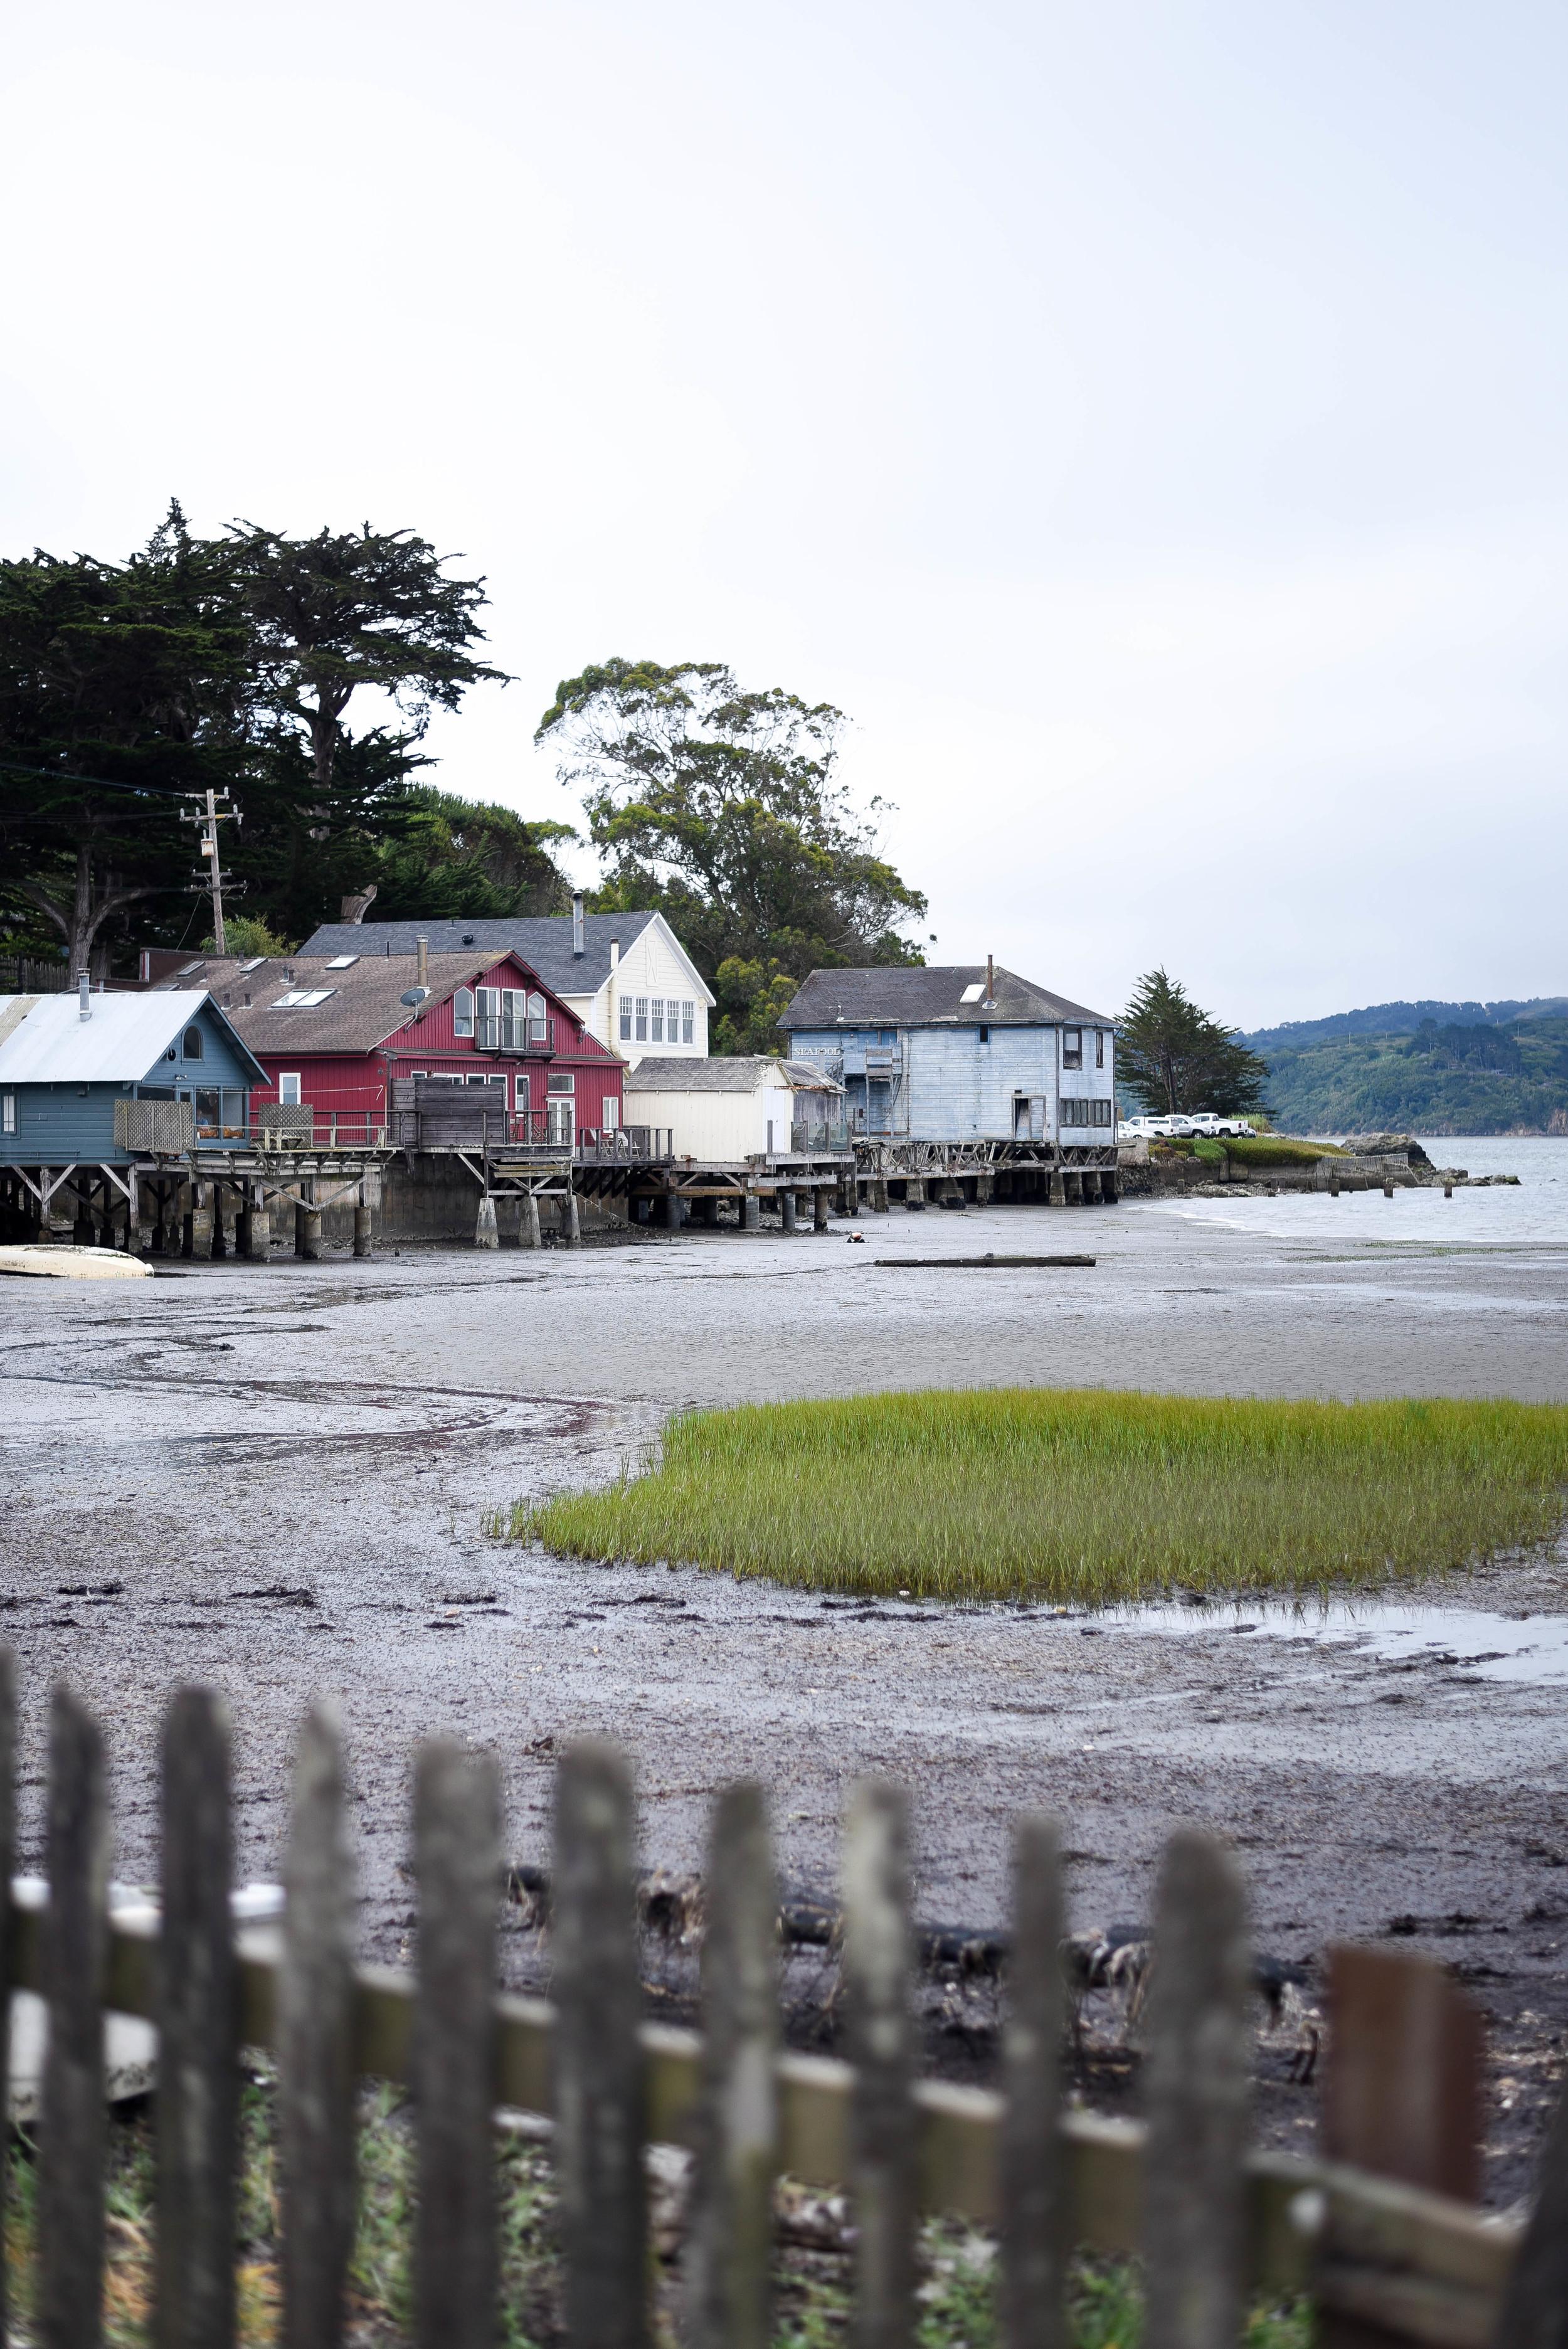 Visit Hog Island Oyster Farm in Marshall, Ca | asavvylifestyle.com